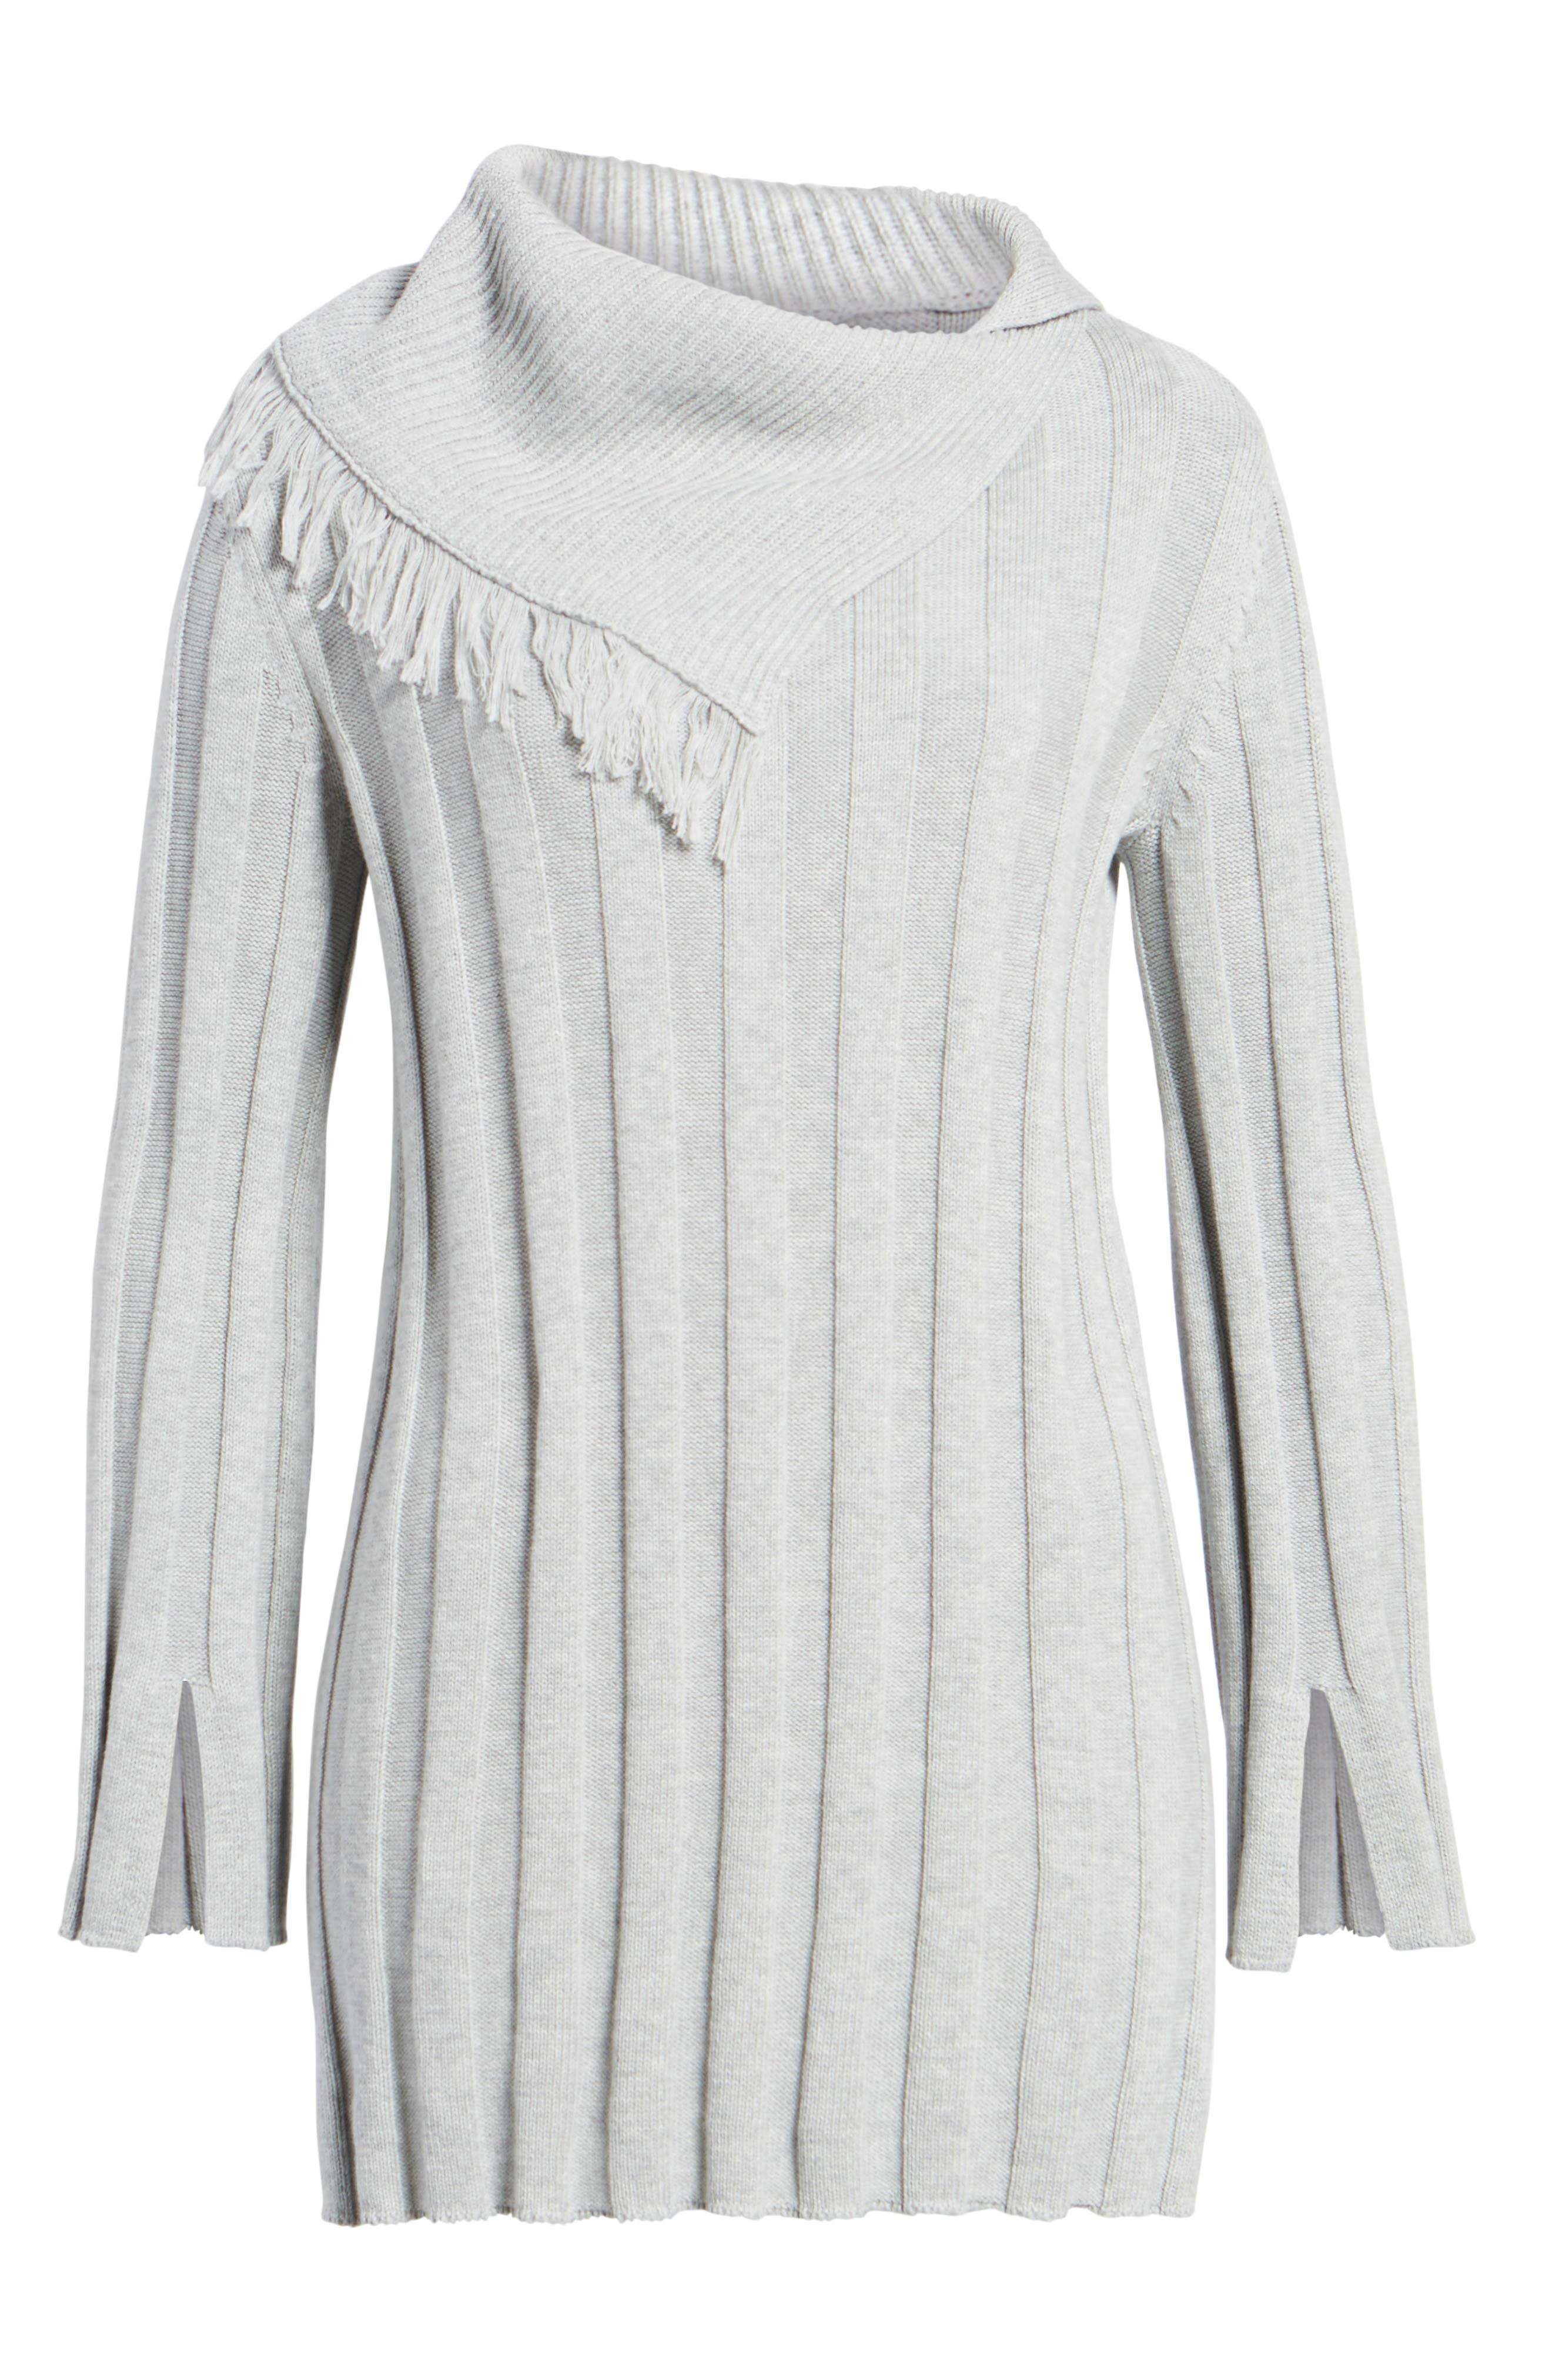 Fringe Cowl Neck Sweater,                             Alternate thumbnail 17, color,